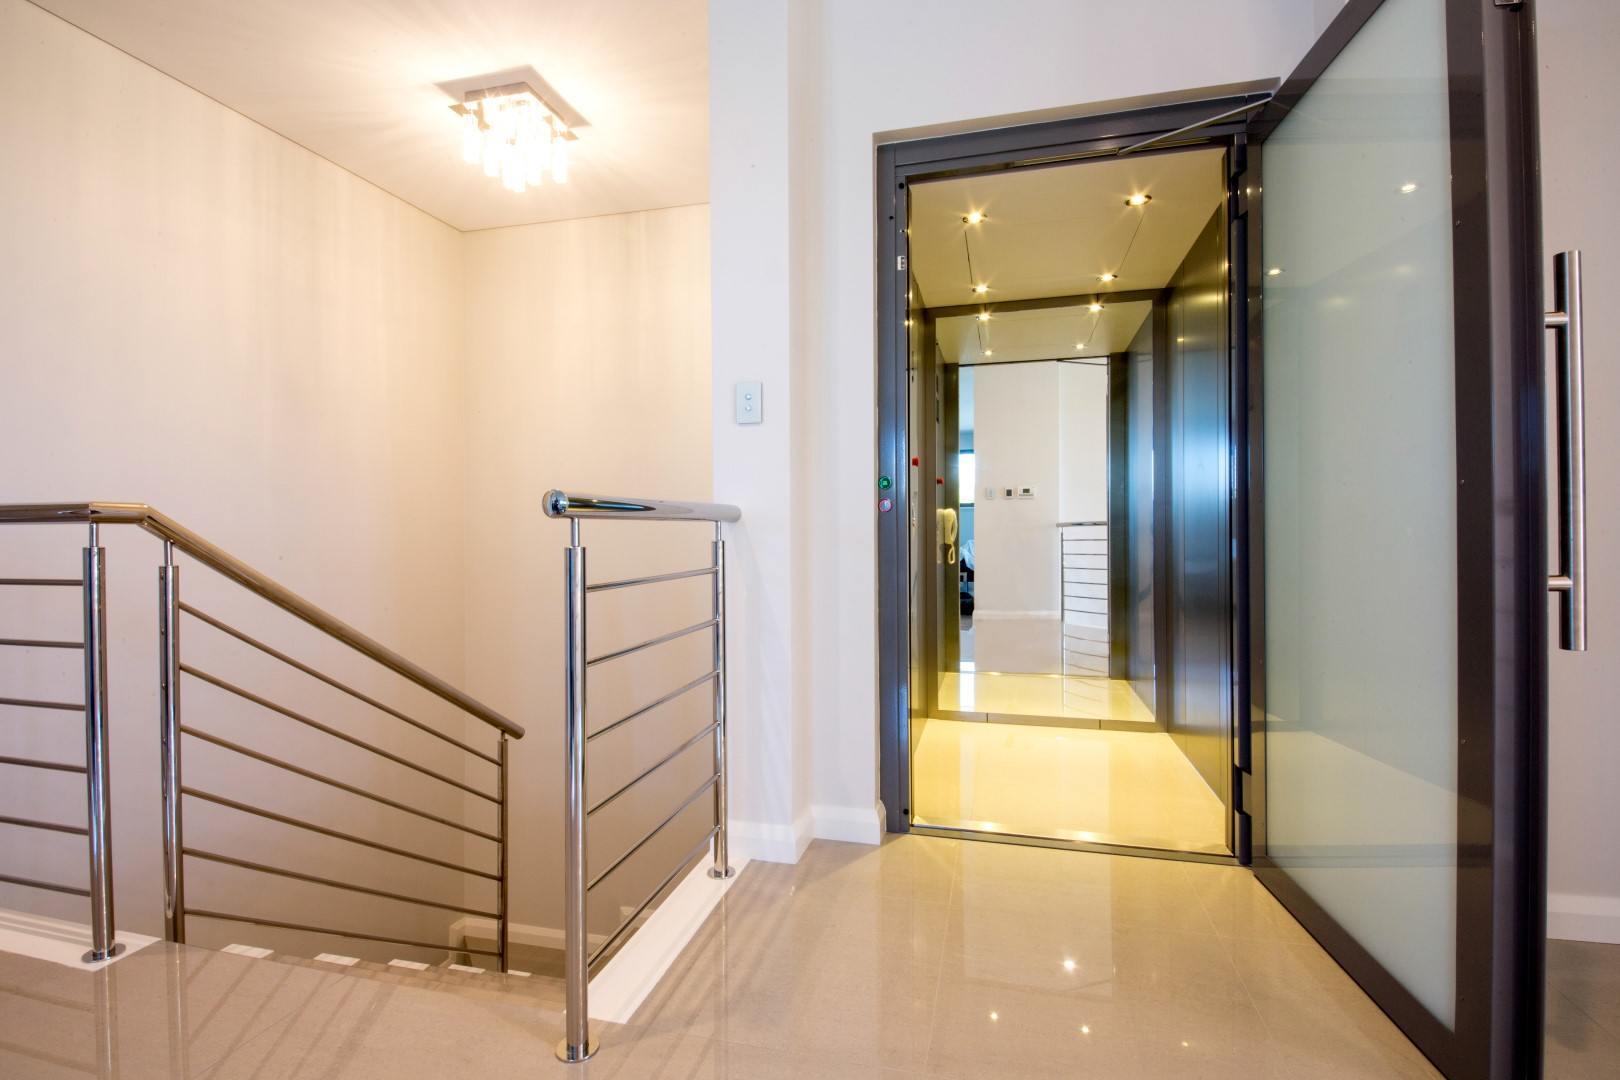 Residential Elevators Are Lifting The Bar - West Coast Elevators